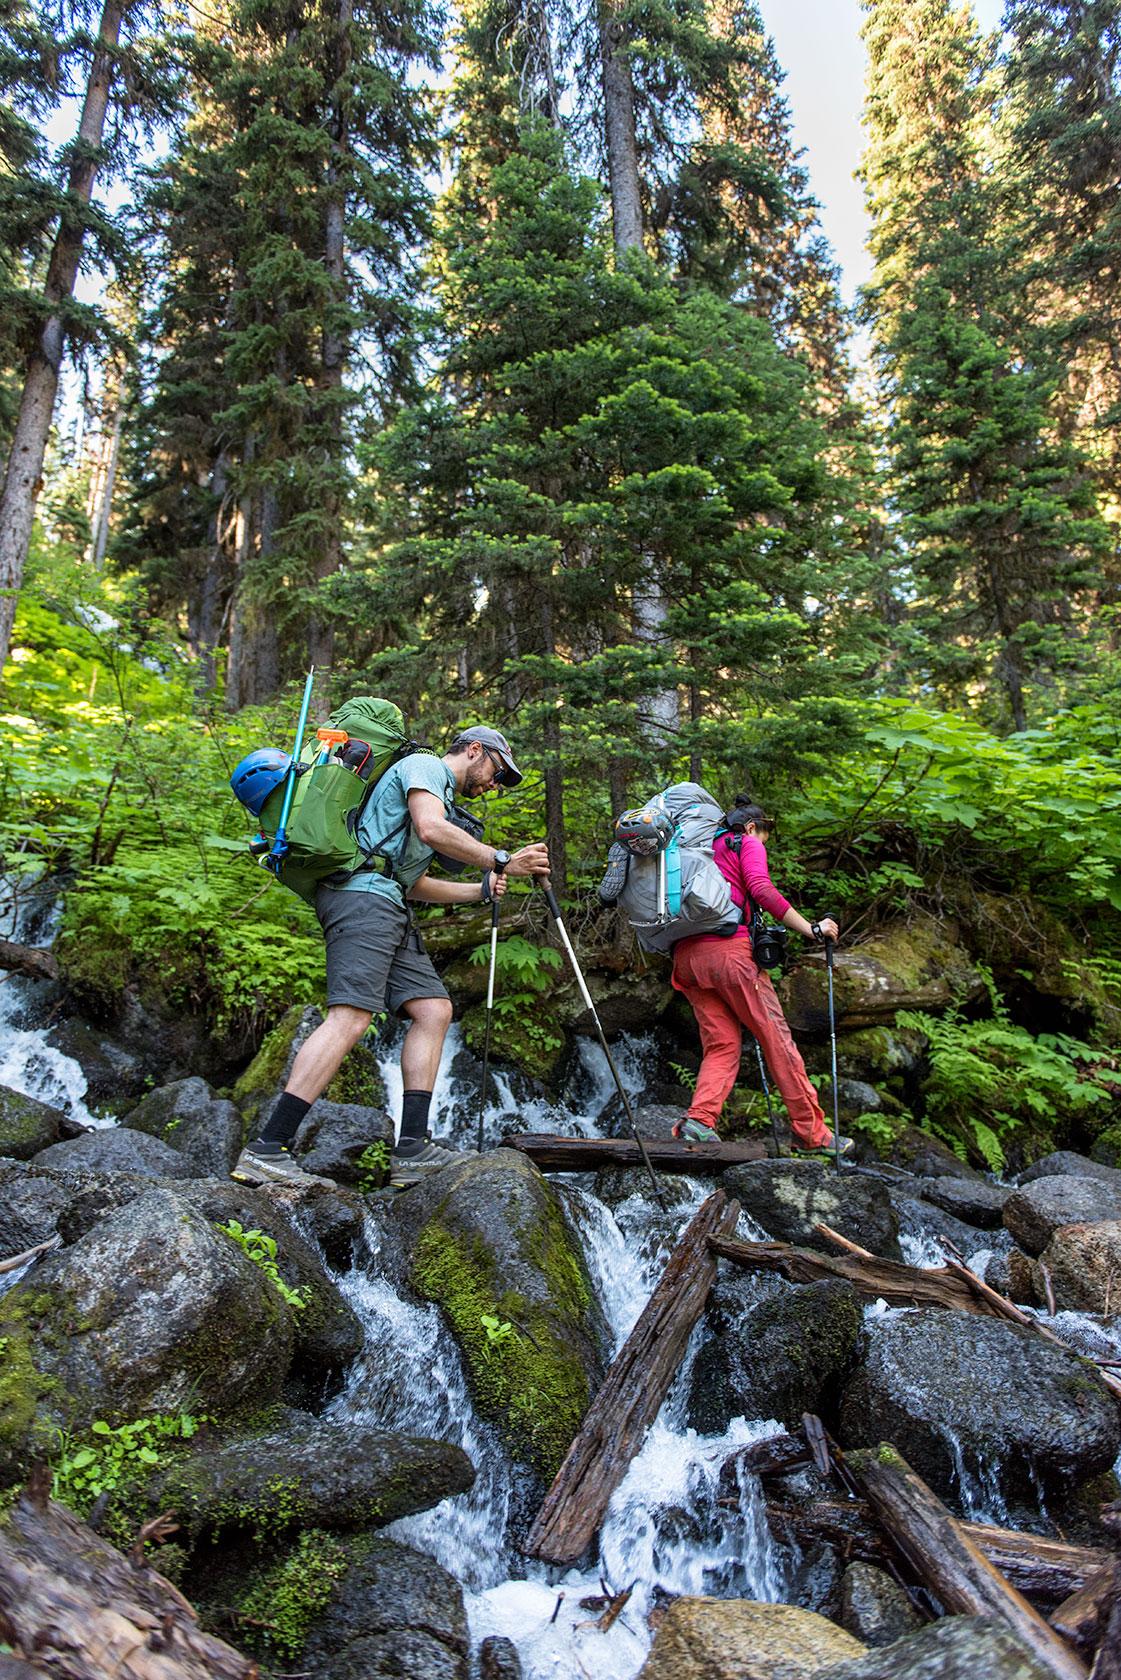 austin-trigg-osprey-hiking-backpacks-hike-camp-washington-adventure-morning-sunrise-lifestyle-outdoor-enchantments-stream-crossing-forest.jpg